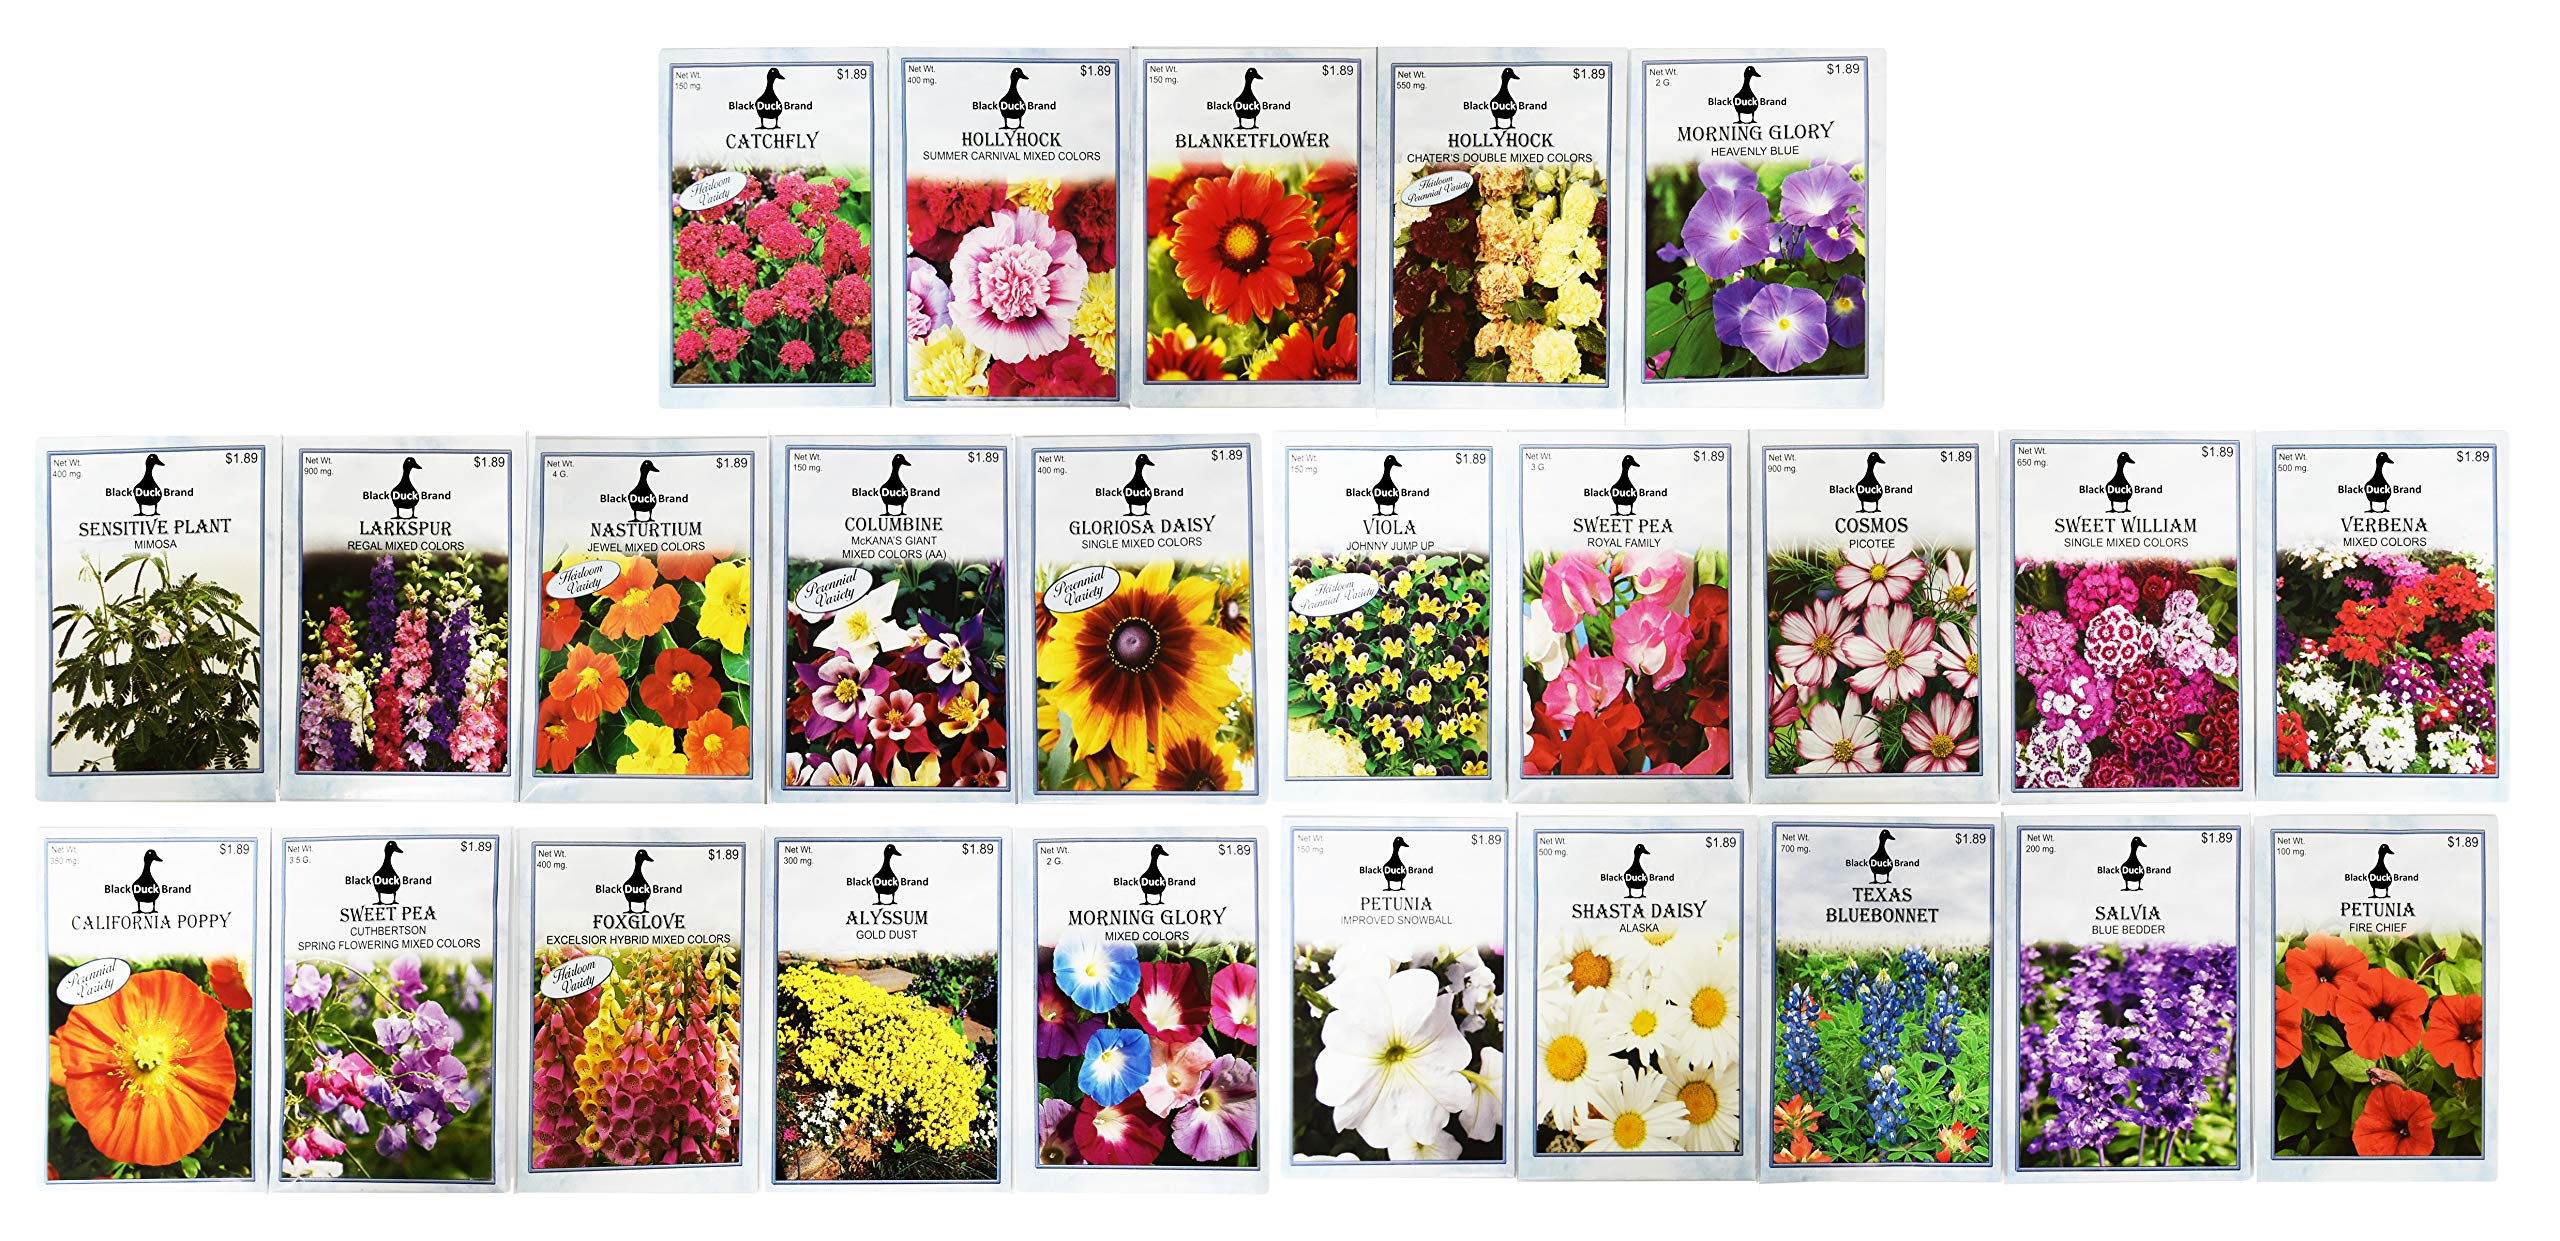 Set of 25 Premium Selection Flower Seed Packets! Flower Seeds in Bulk - 25 Deluxe Varieties! by Black Duck Brand